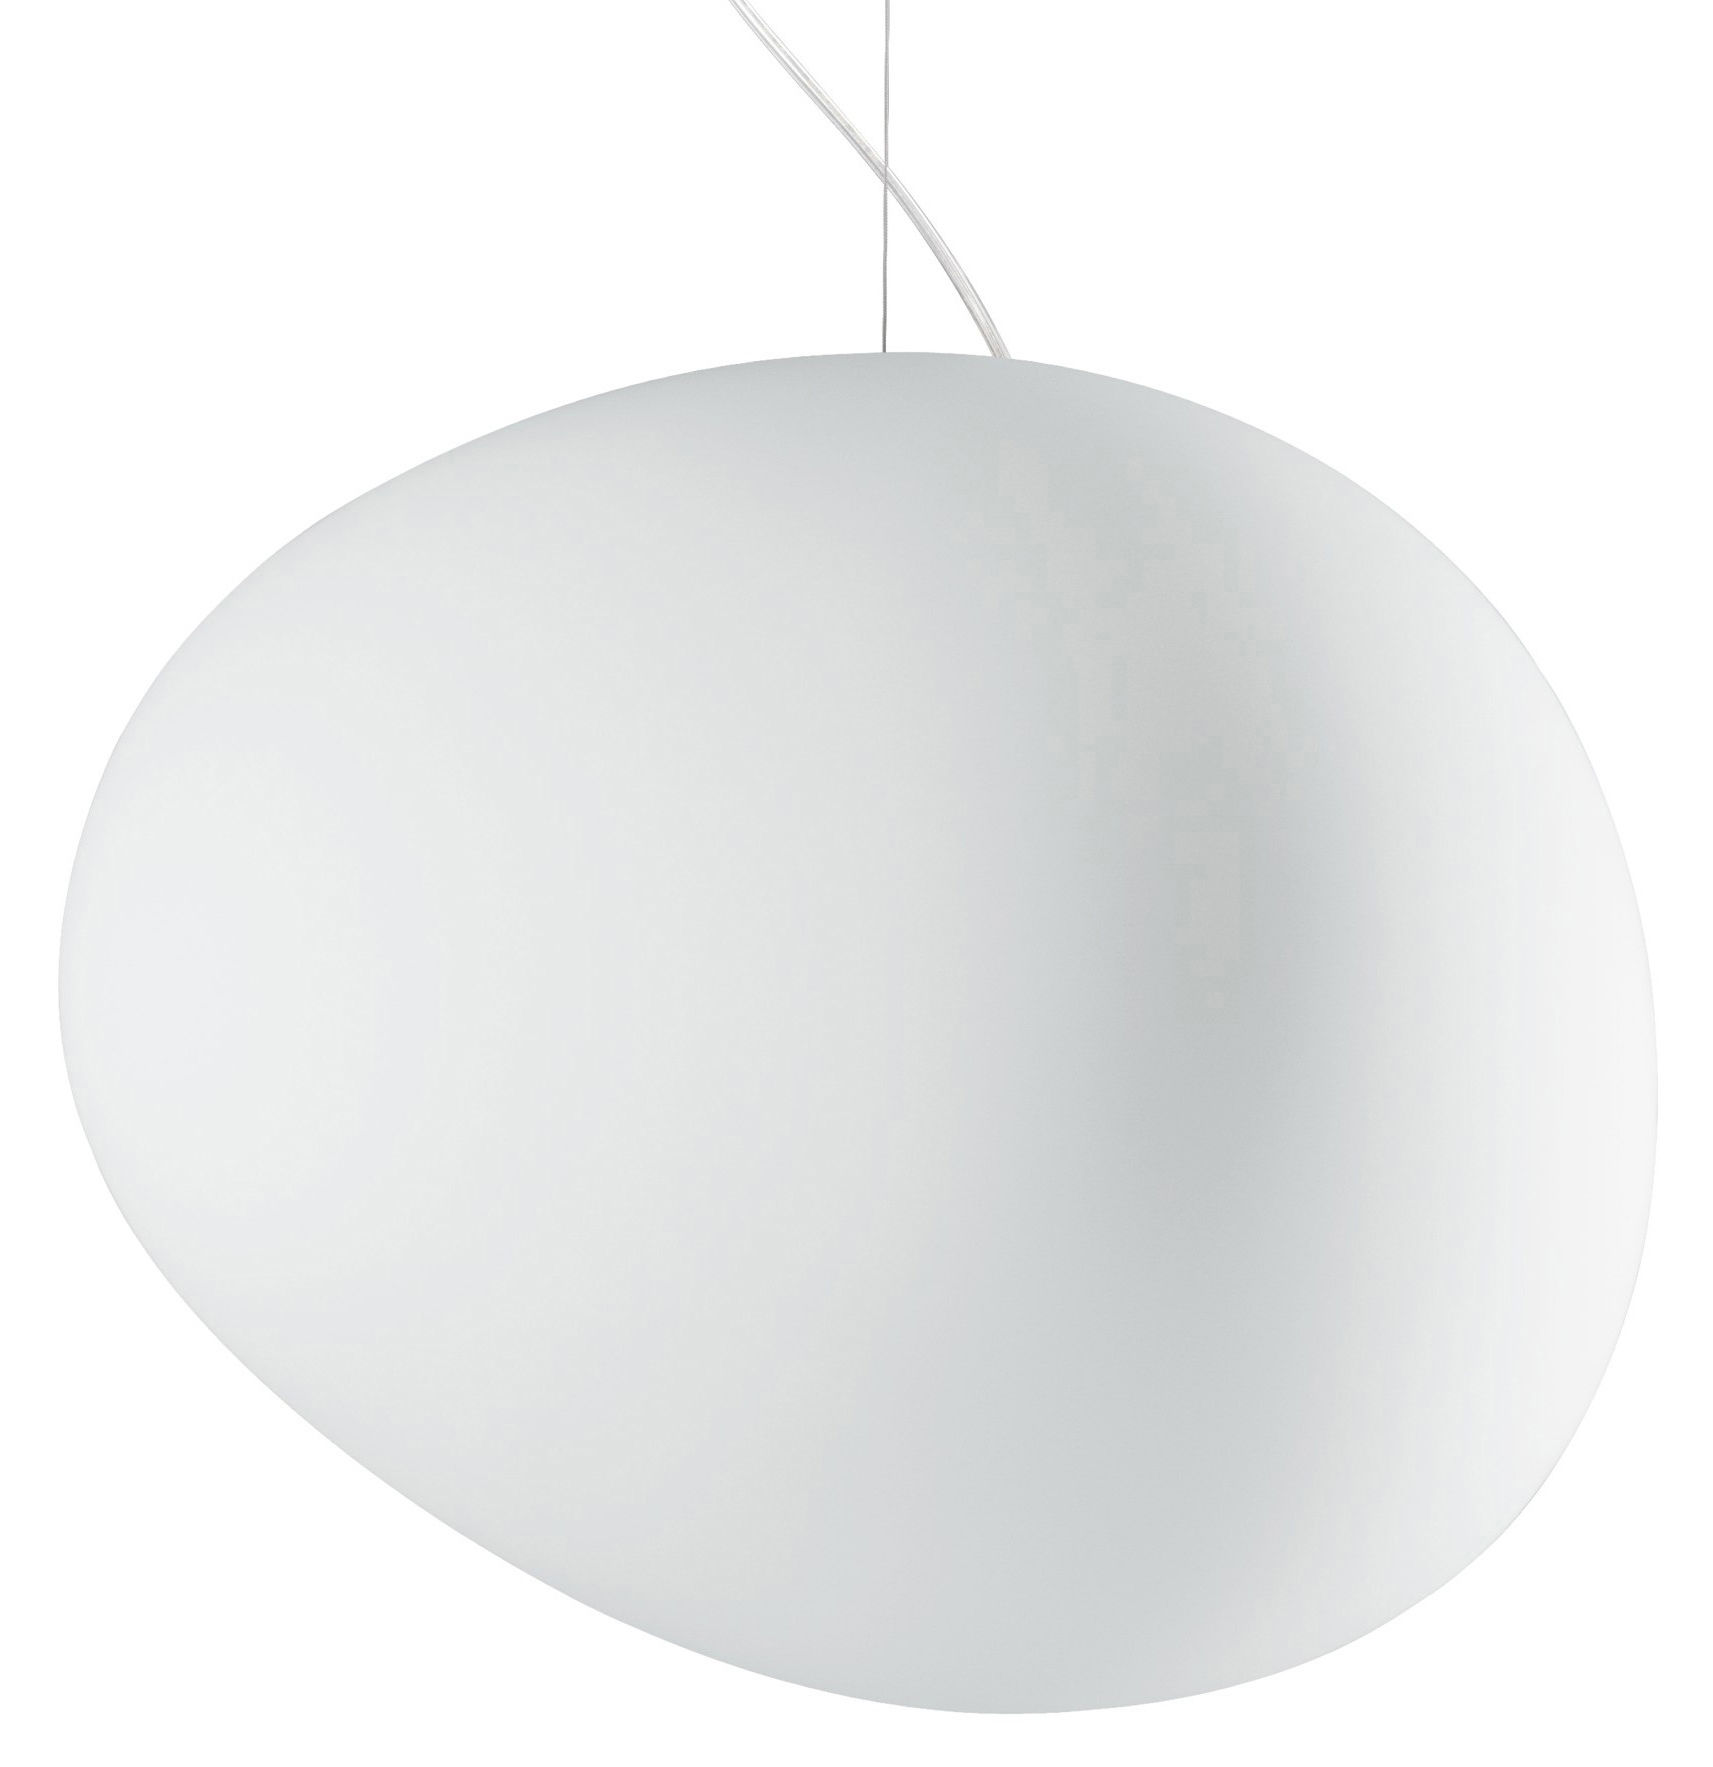 Luminaire - Suspensions - Suspension Gregg Grande / Verre - Foscarini - L 47 cm / Blanc - Verre soufflé